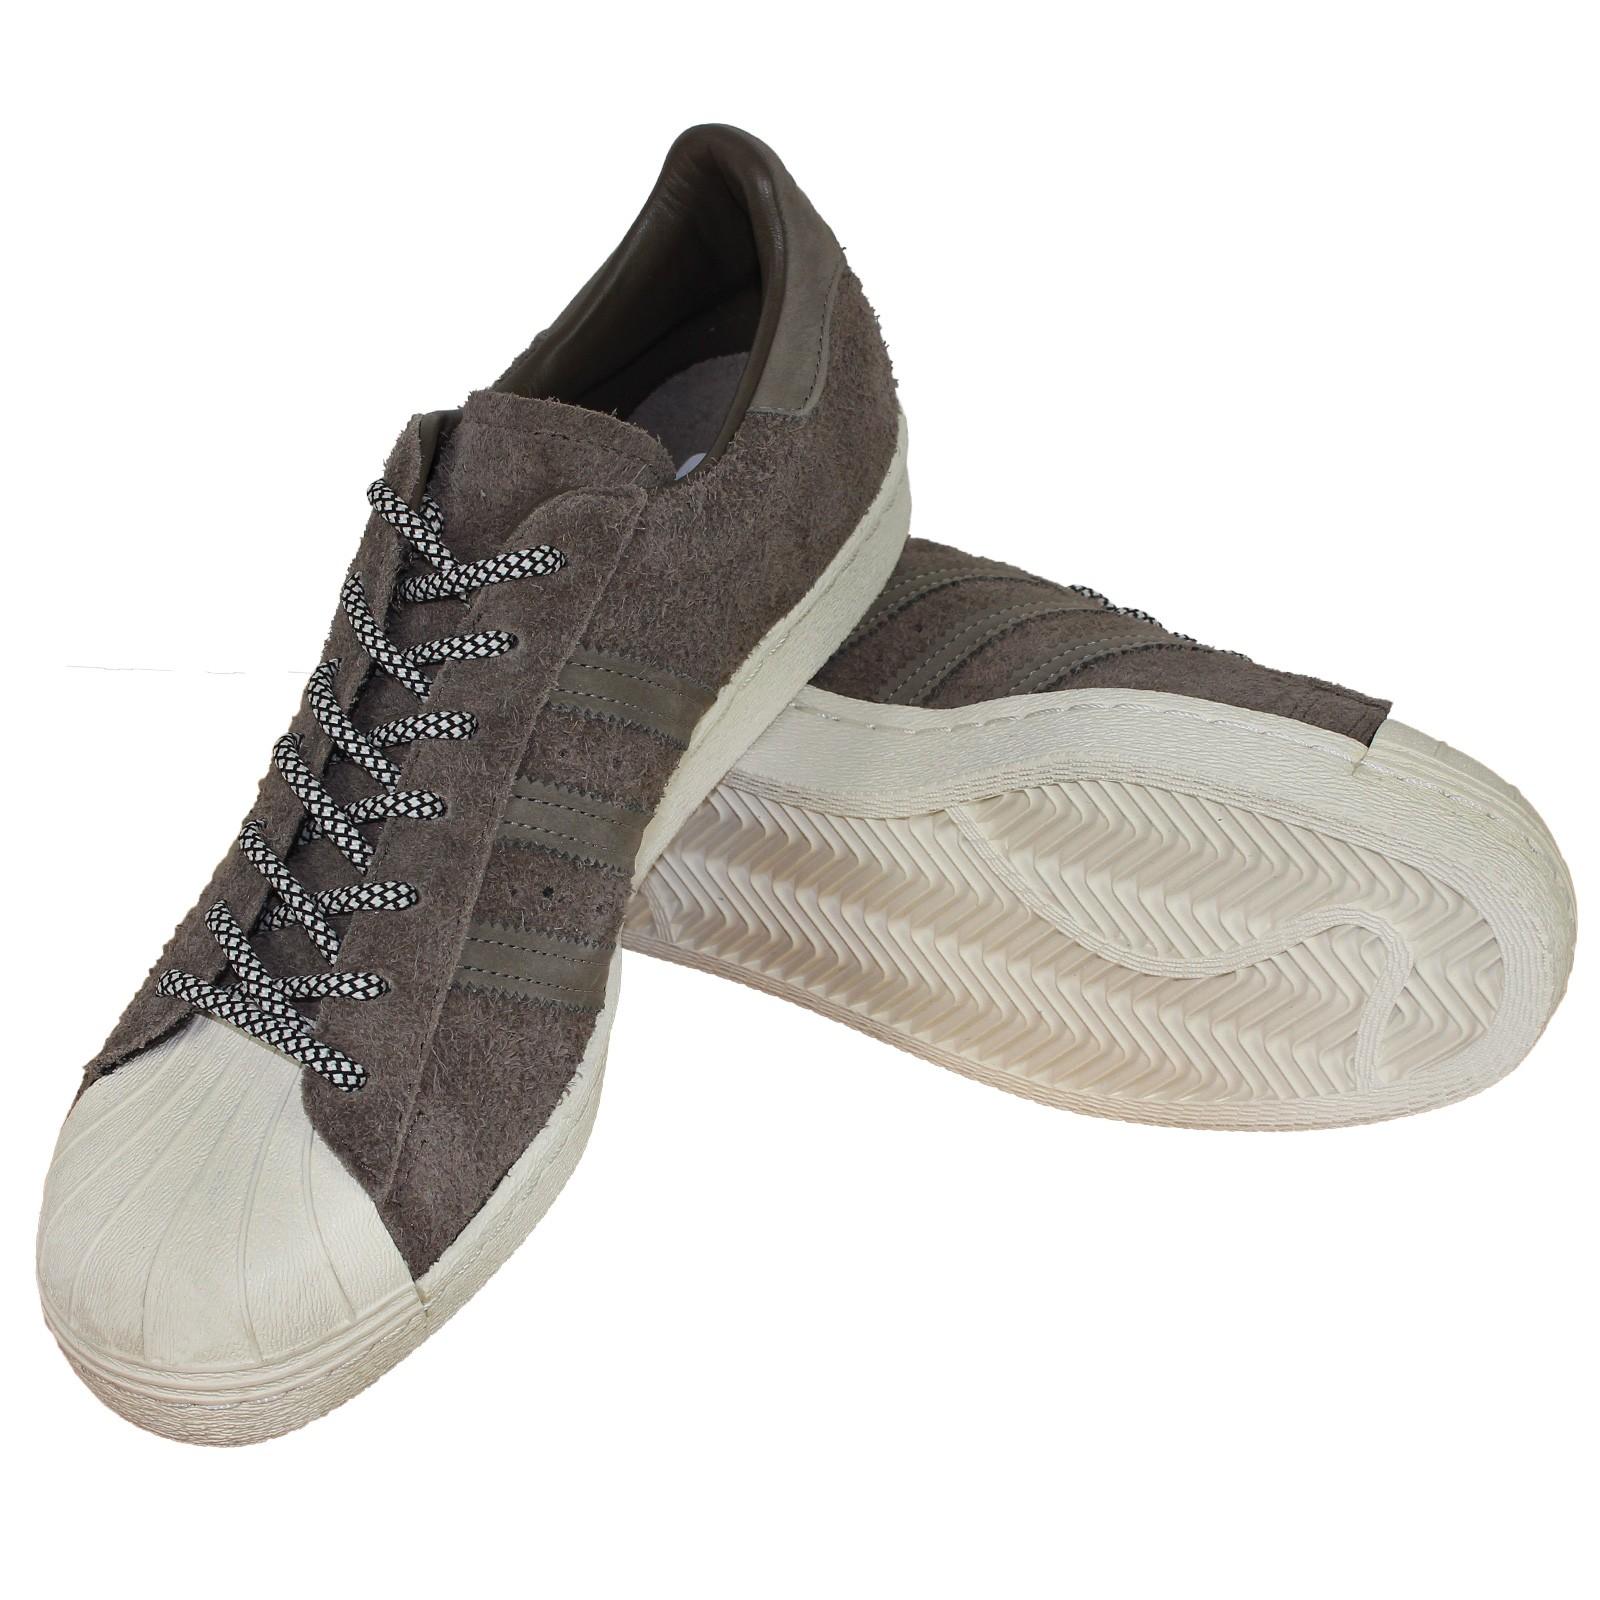 adidas originals superstar 80s s75848 suede sneaker samba. Black Bedroom Furniture Sets. Home Design Ideas